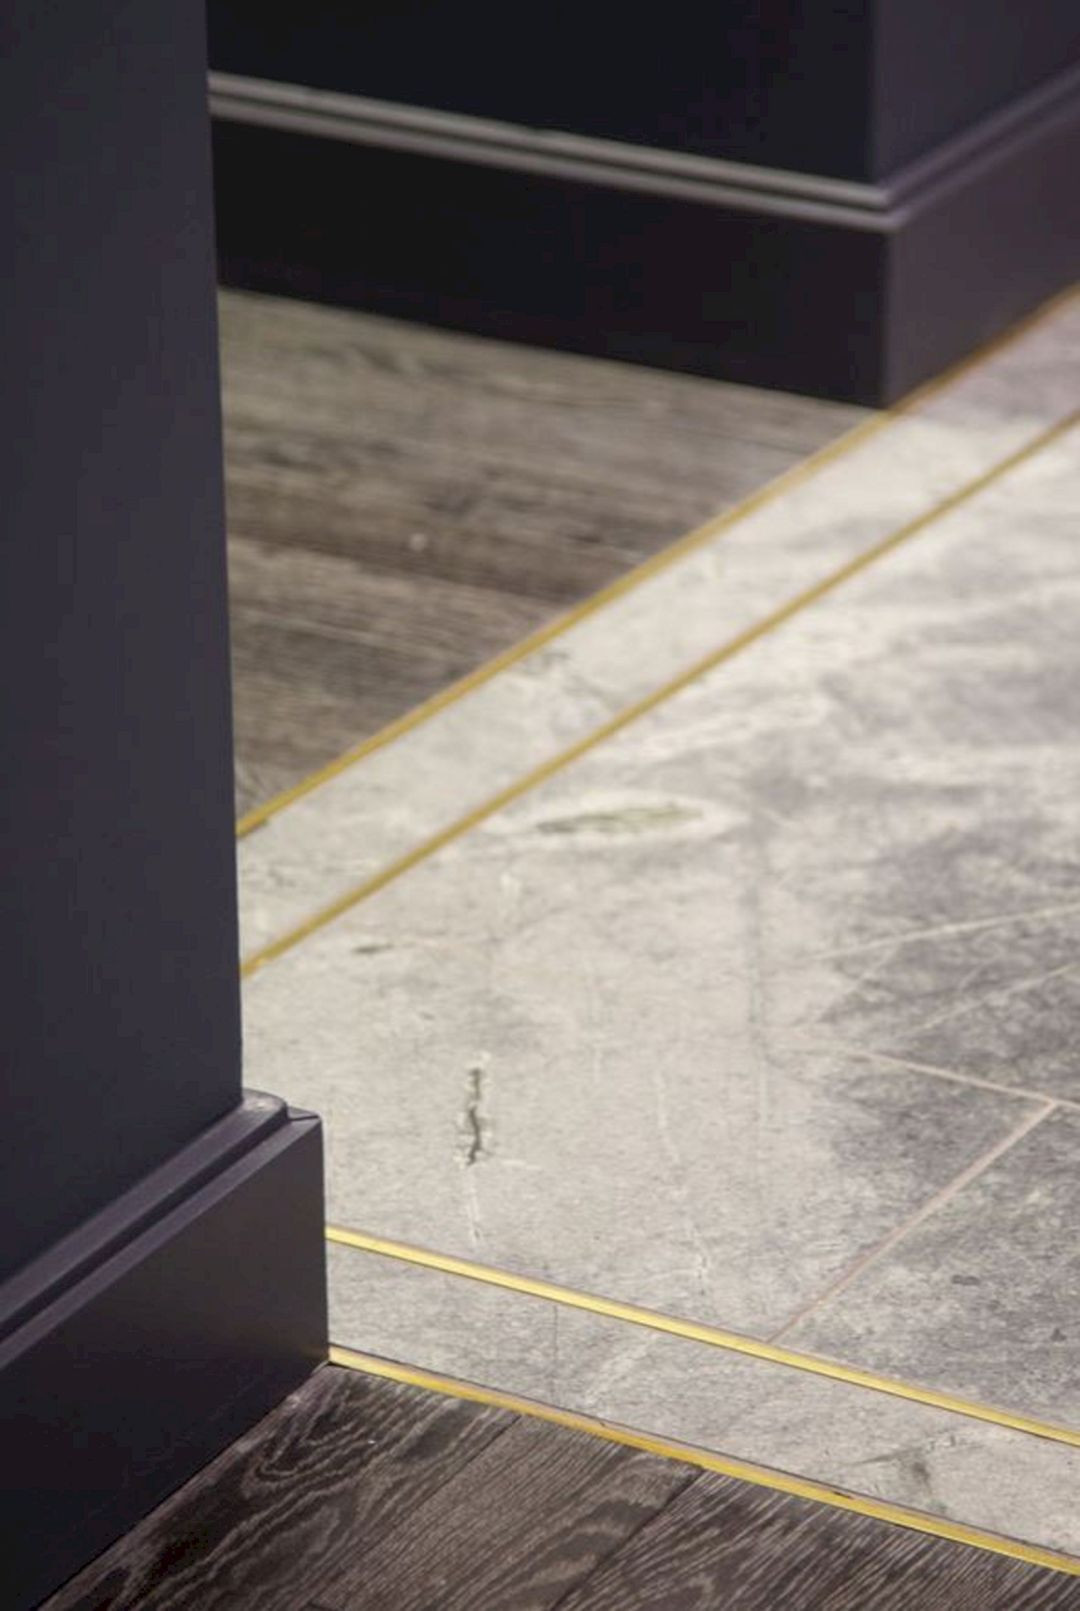 hardwood floor end cap molding of pin by amanda watson on interior ideas inspiration pinterest within concrete wood floor stone flooring foyer flooring metal floor metal trim